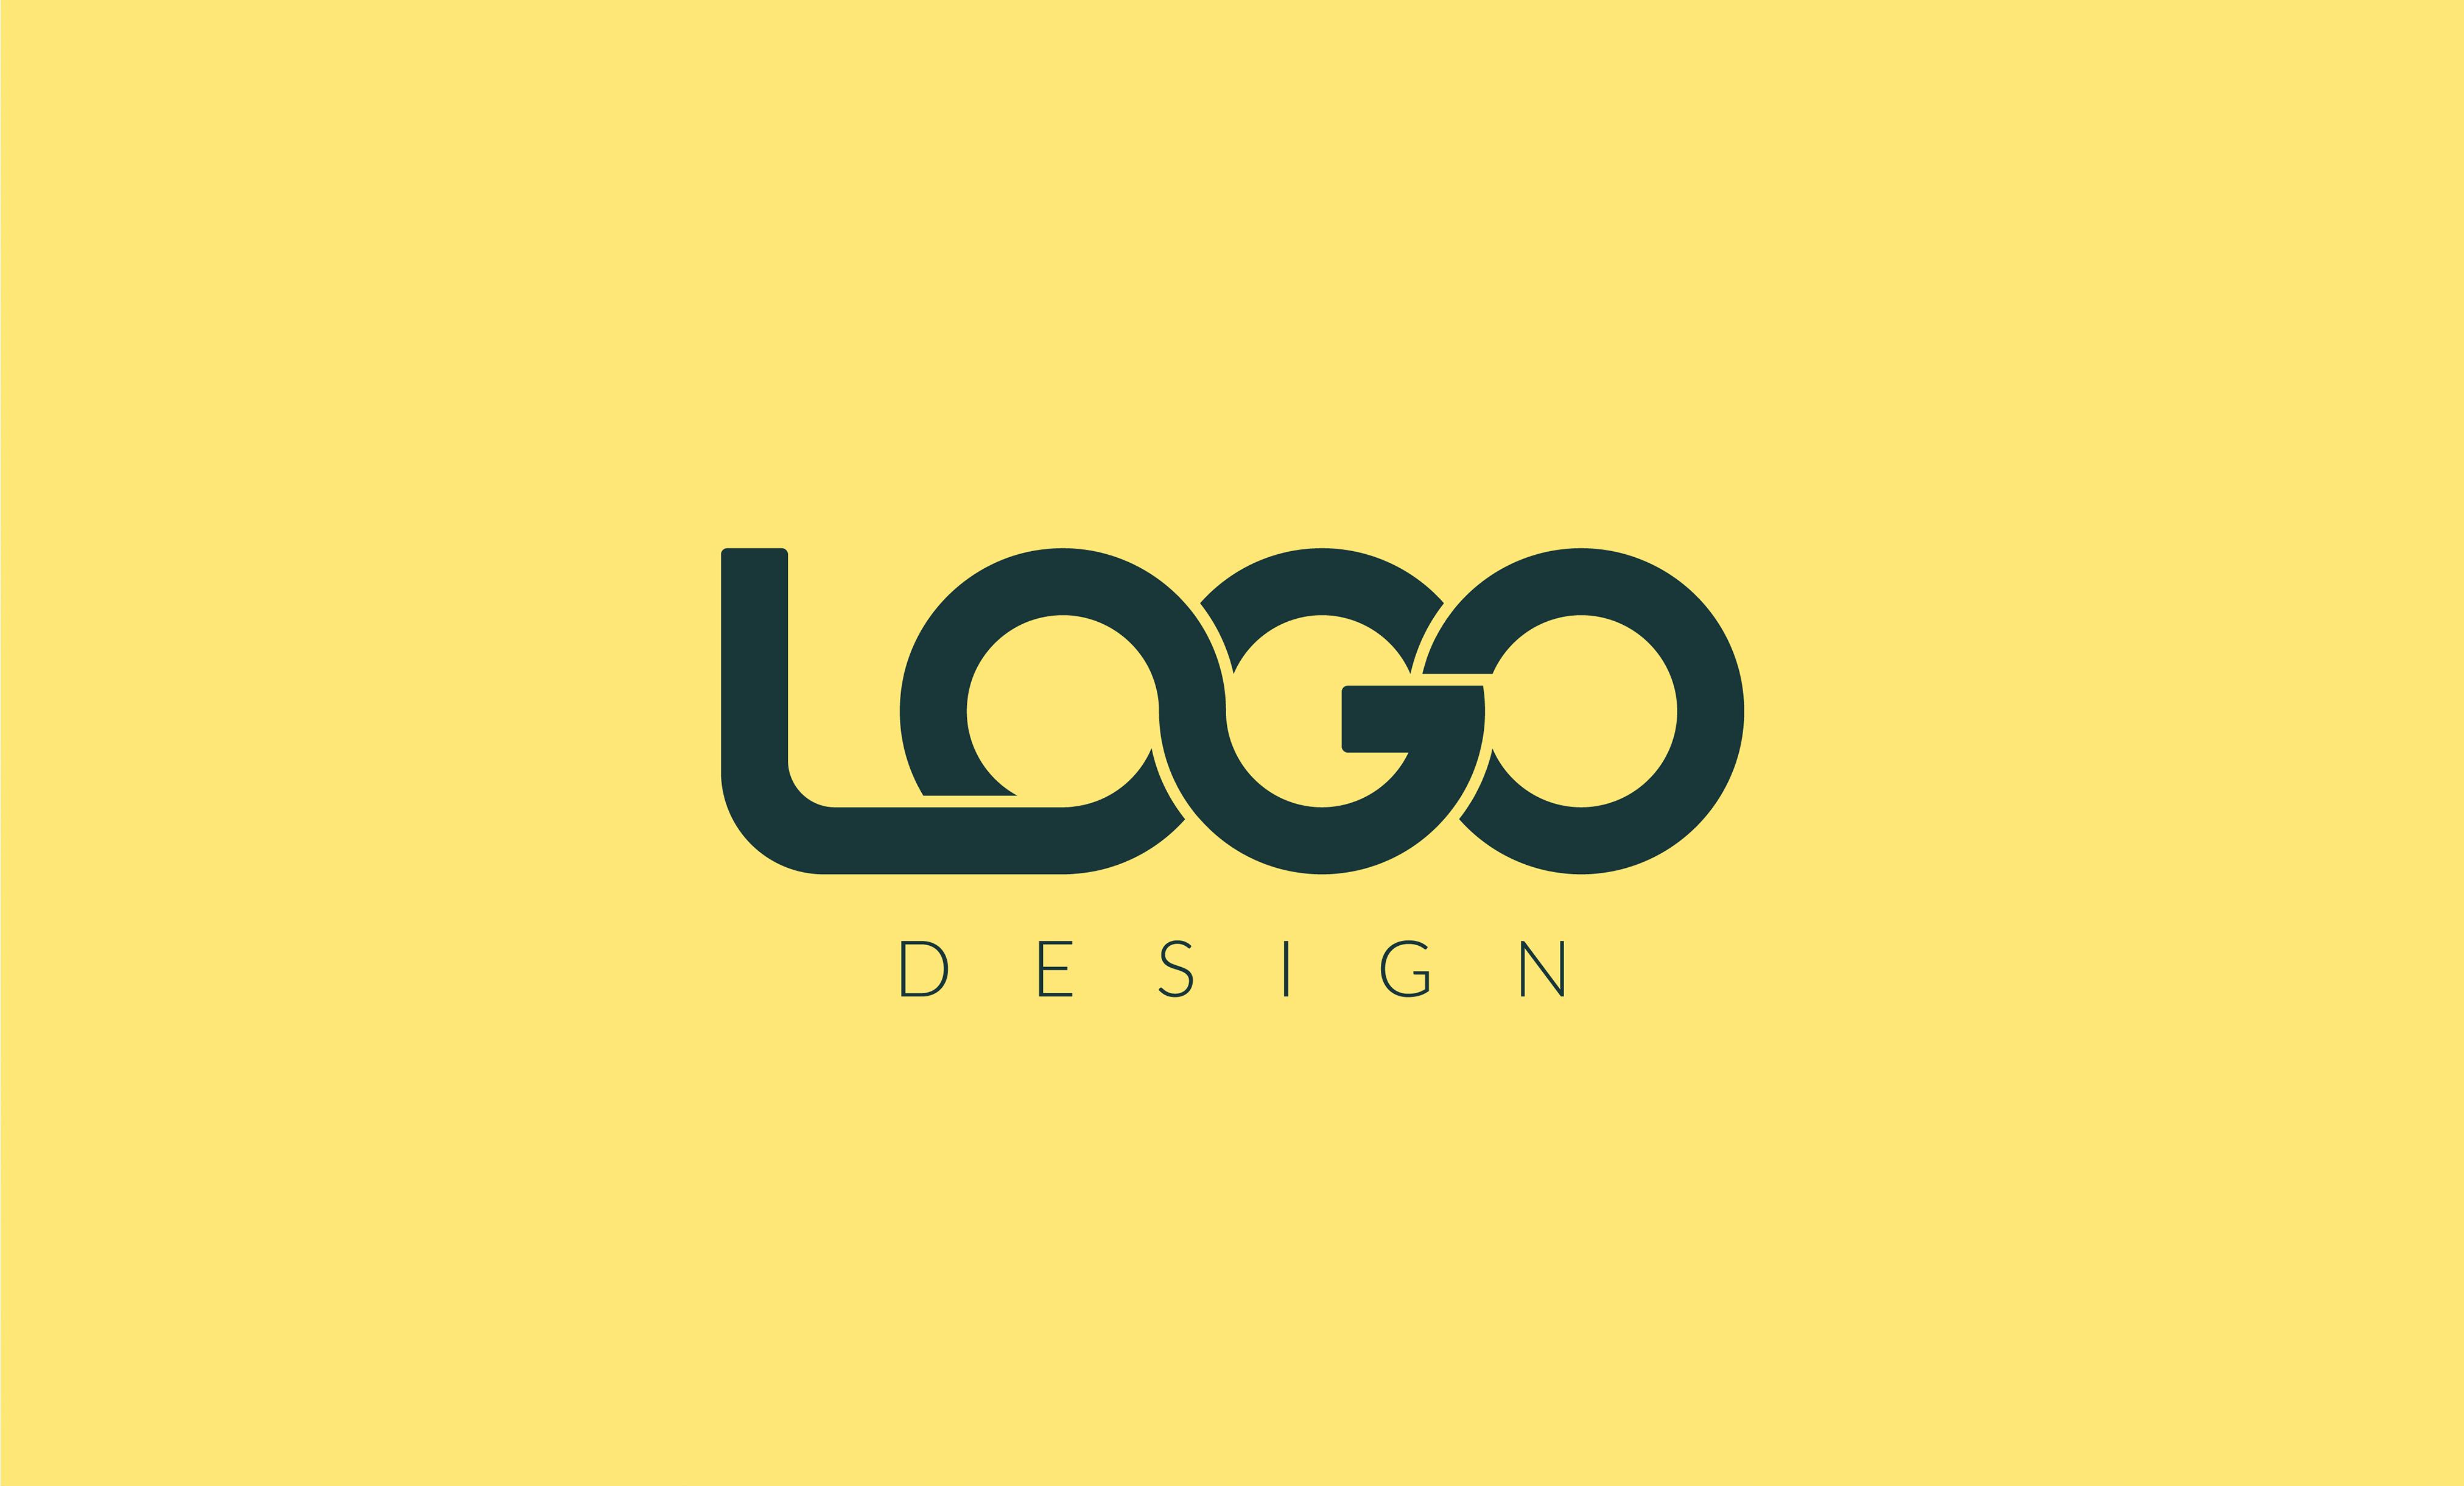 Design your unique professional logo super-fast